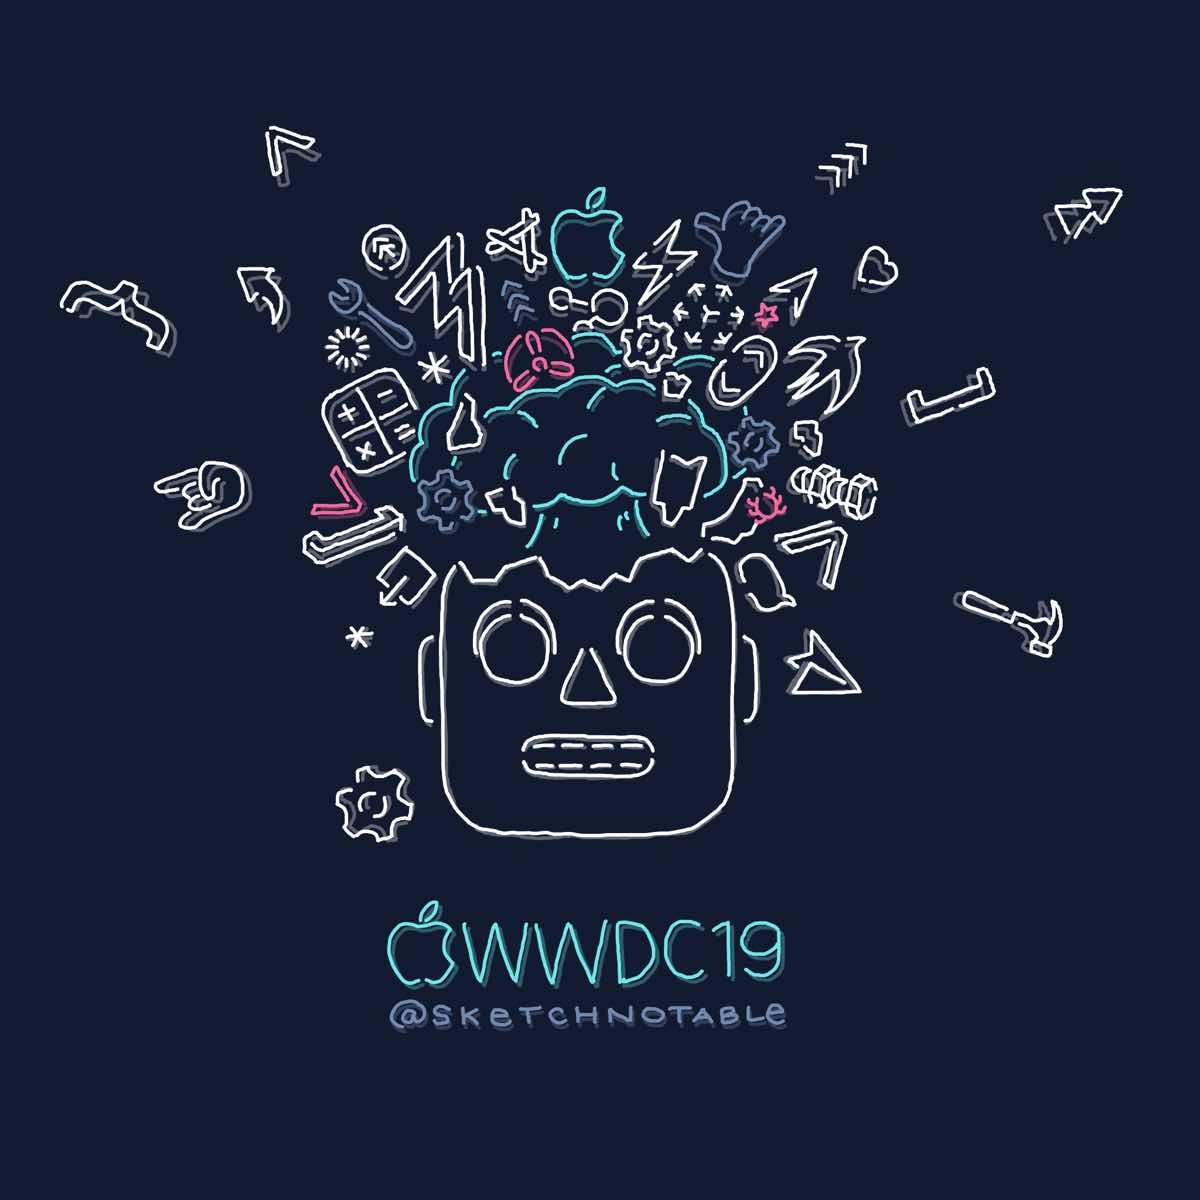 WWDC Sketchnotes